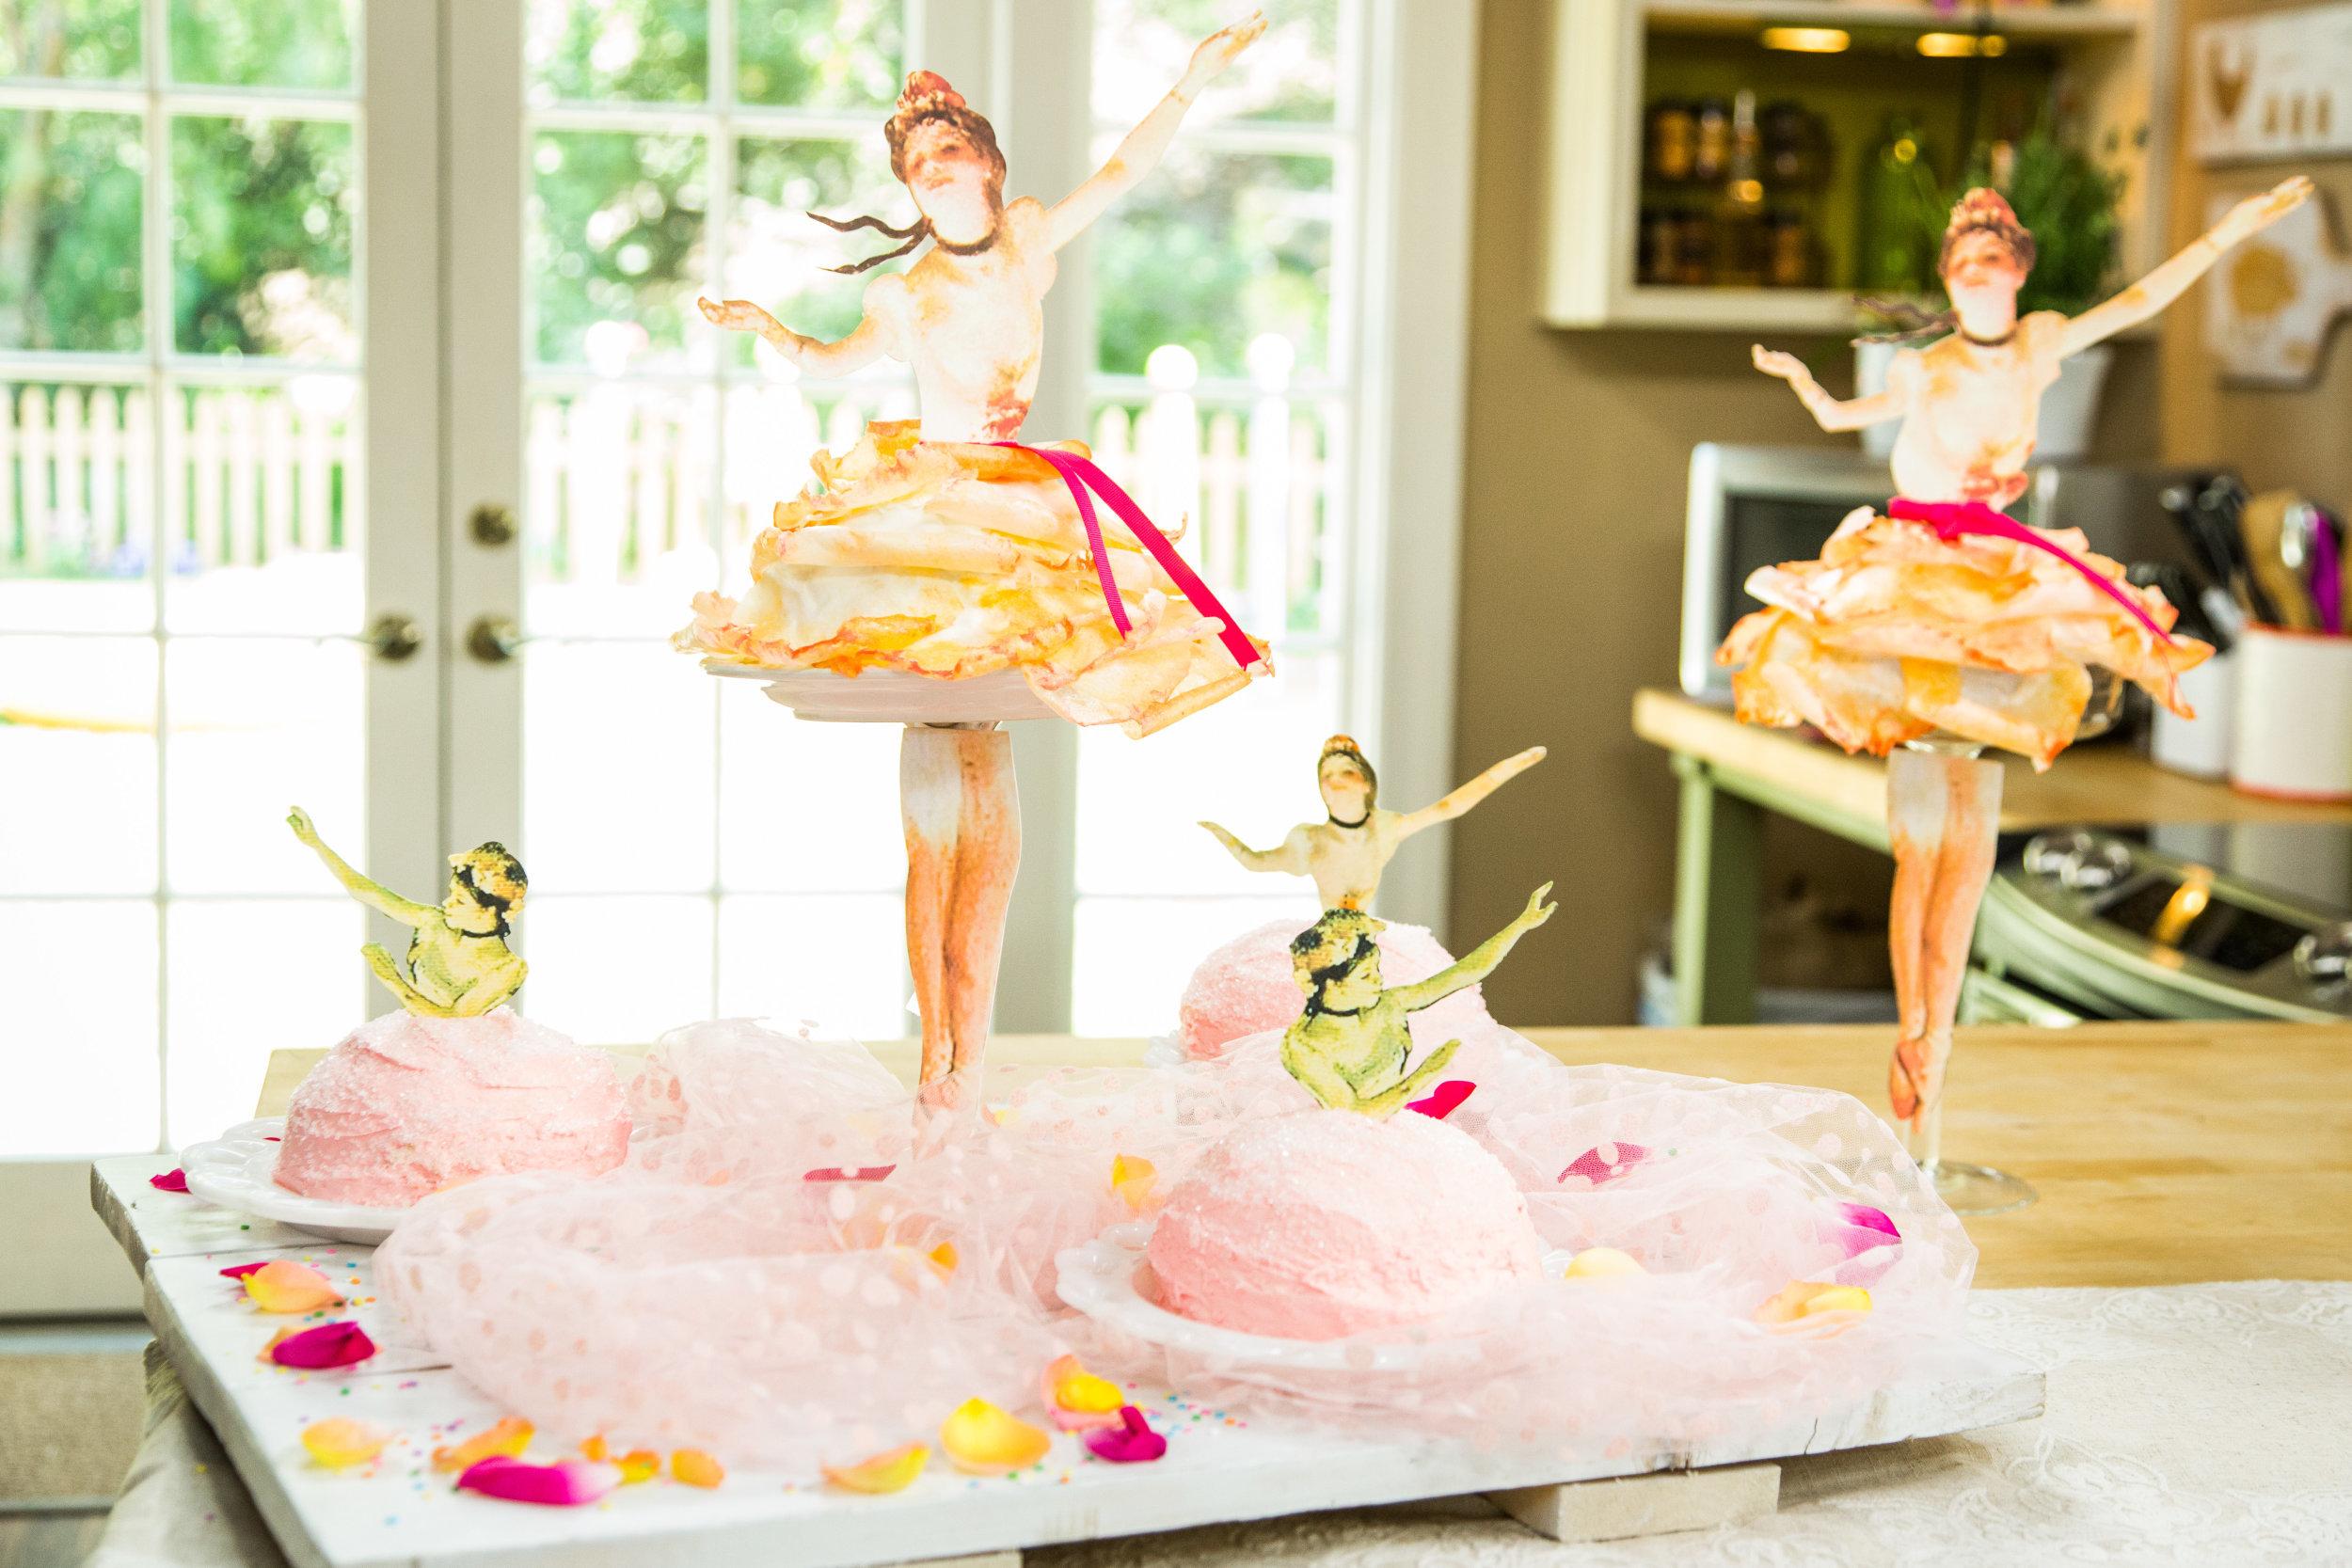 How To Home Family Ballerina Birthday Cake Hallmark Channel